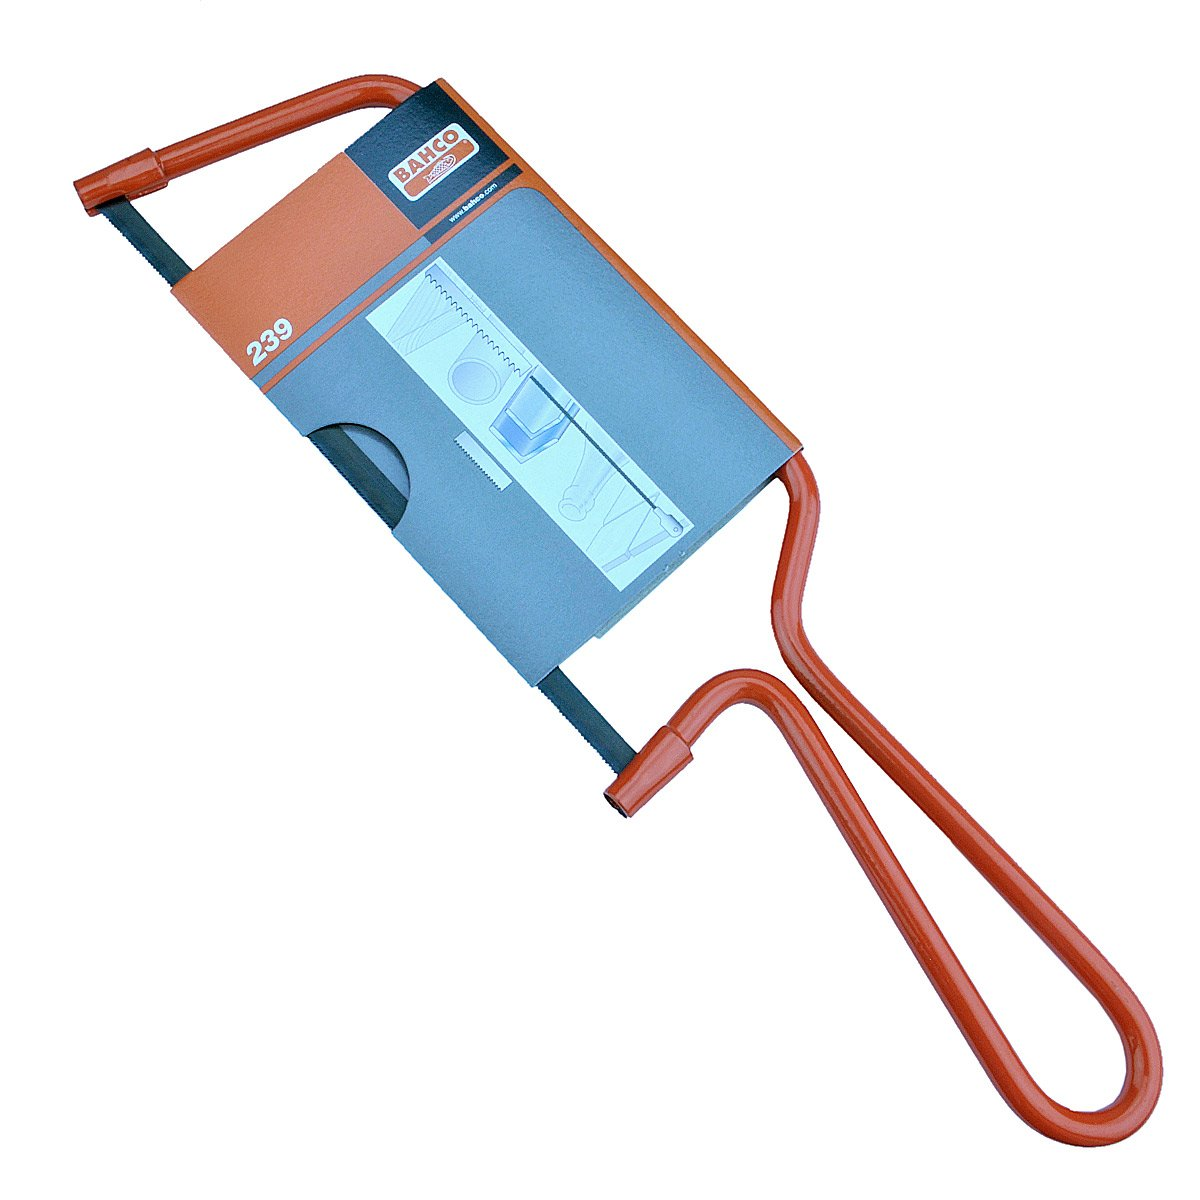 Draper Redline 67816 Junior Hacksaw